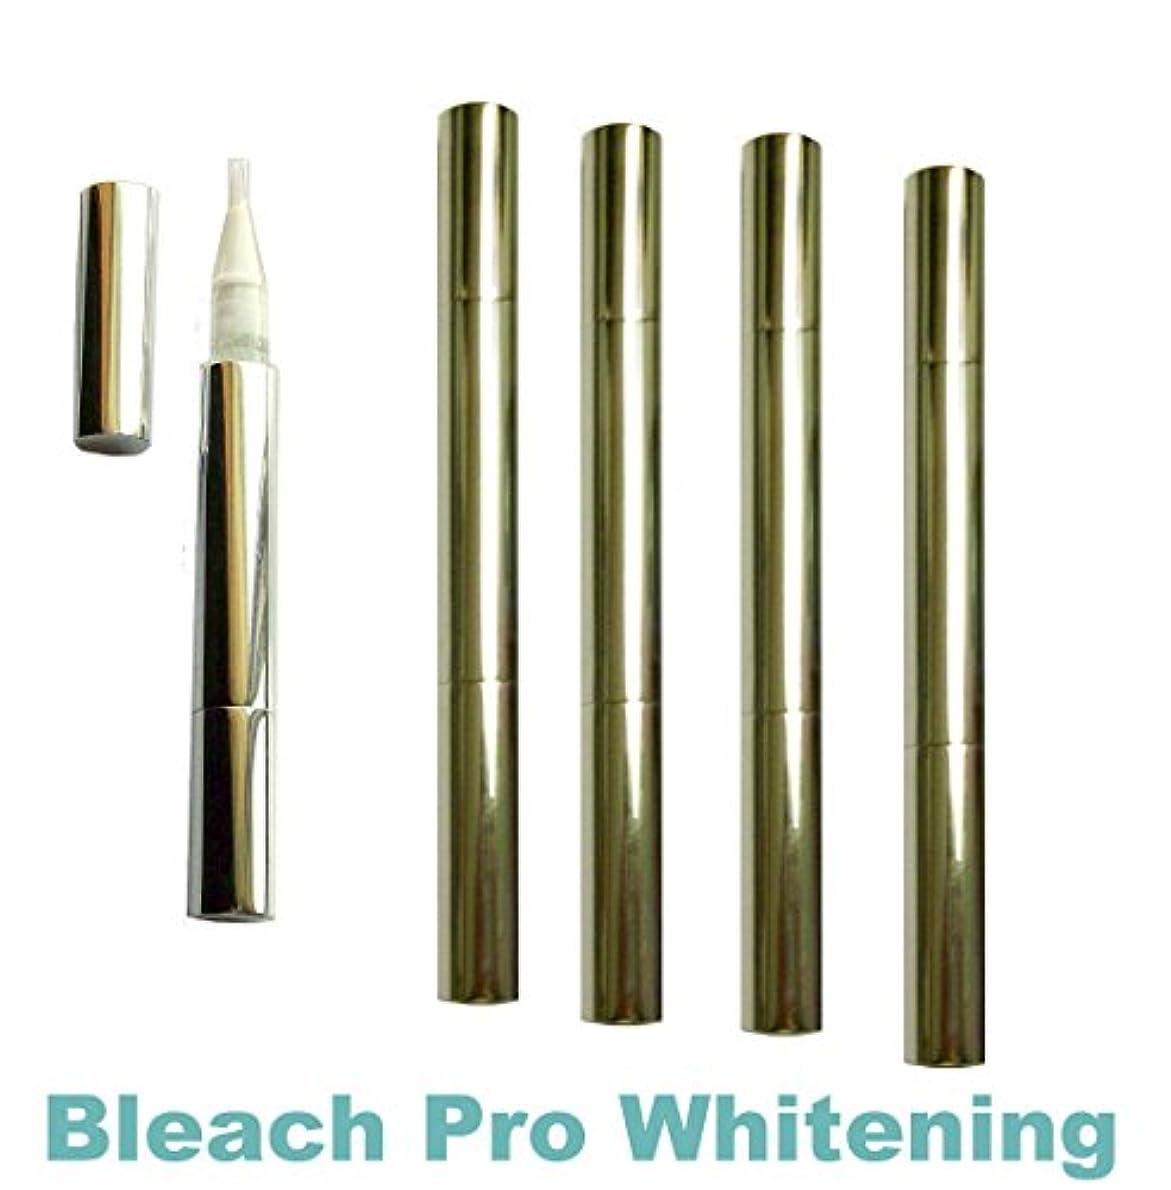 Teeth Whitening Gel Pens 35% Carbamide Peroxide Tooth Bleaching Formula Pen with Brush Tip Gel Dispenser. 5 Whitening...